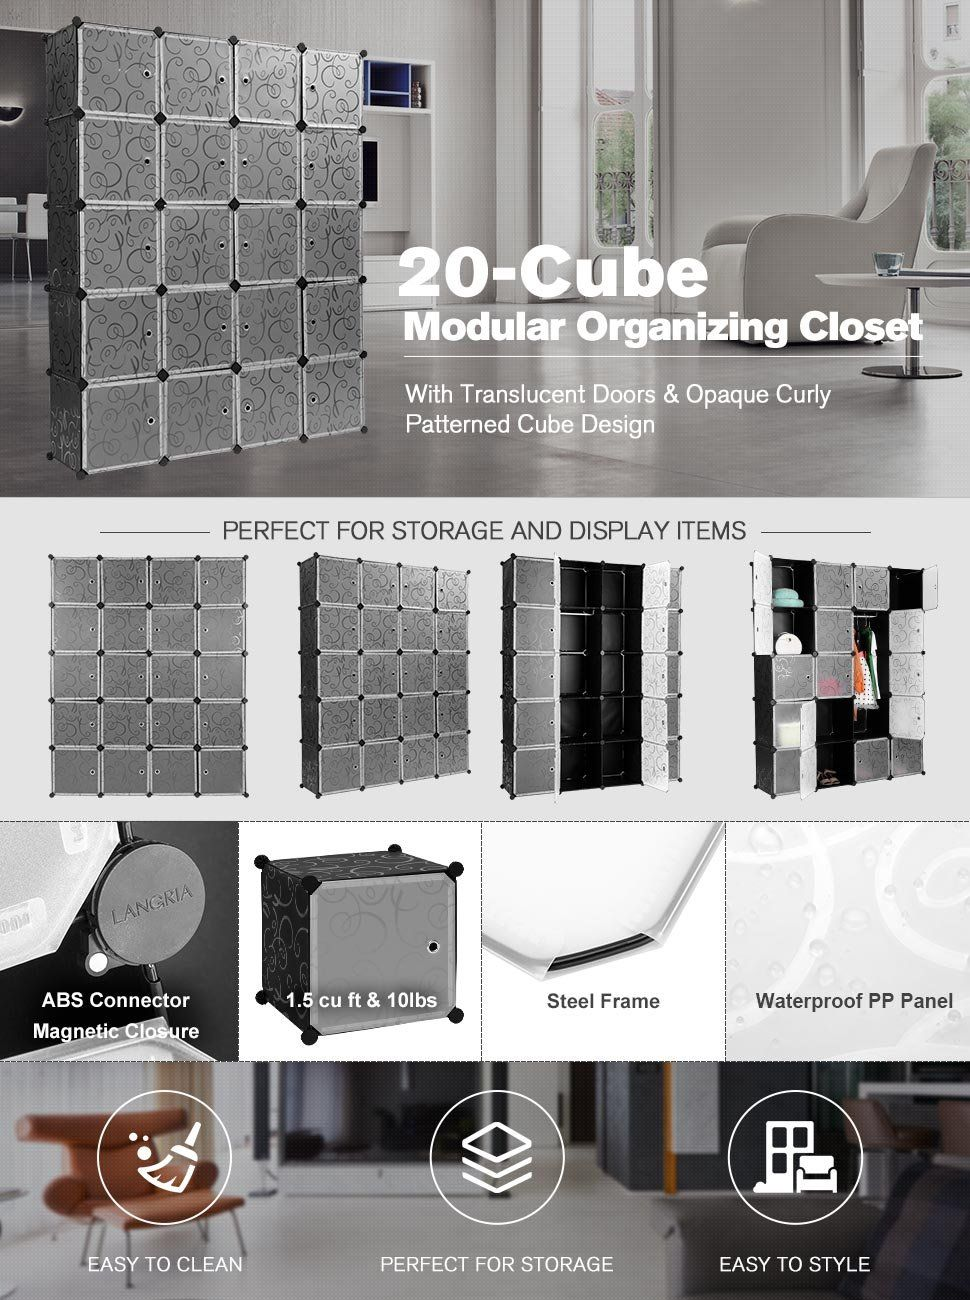 Amazoncom LANGRIA 20Cube DIY Modular Shelving Storage